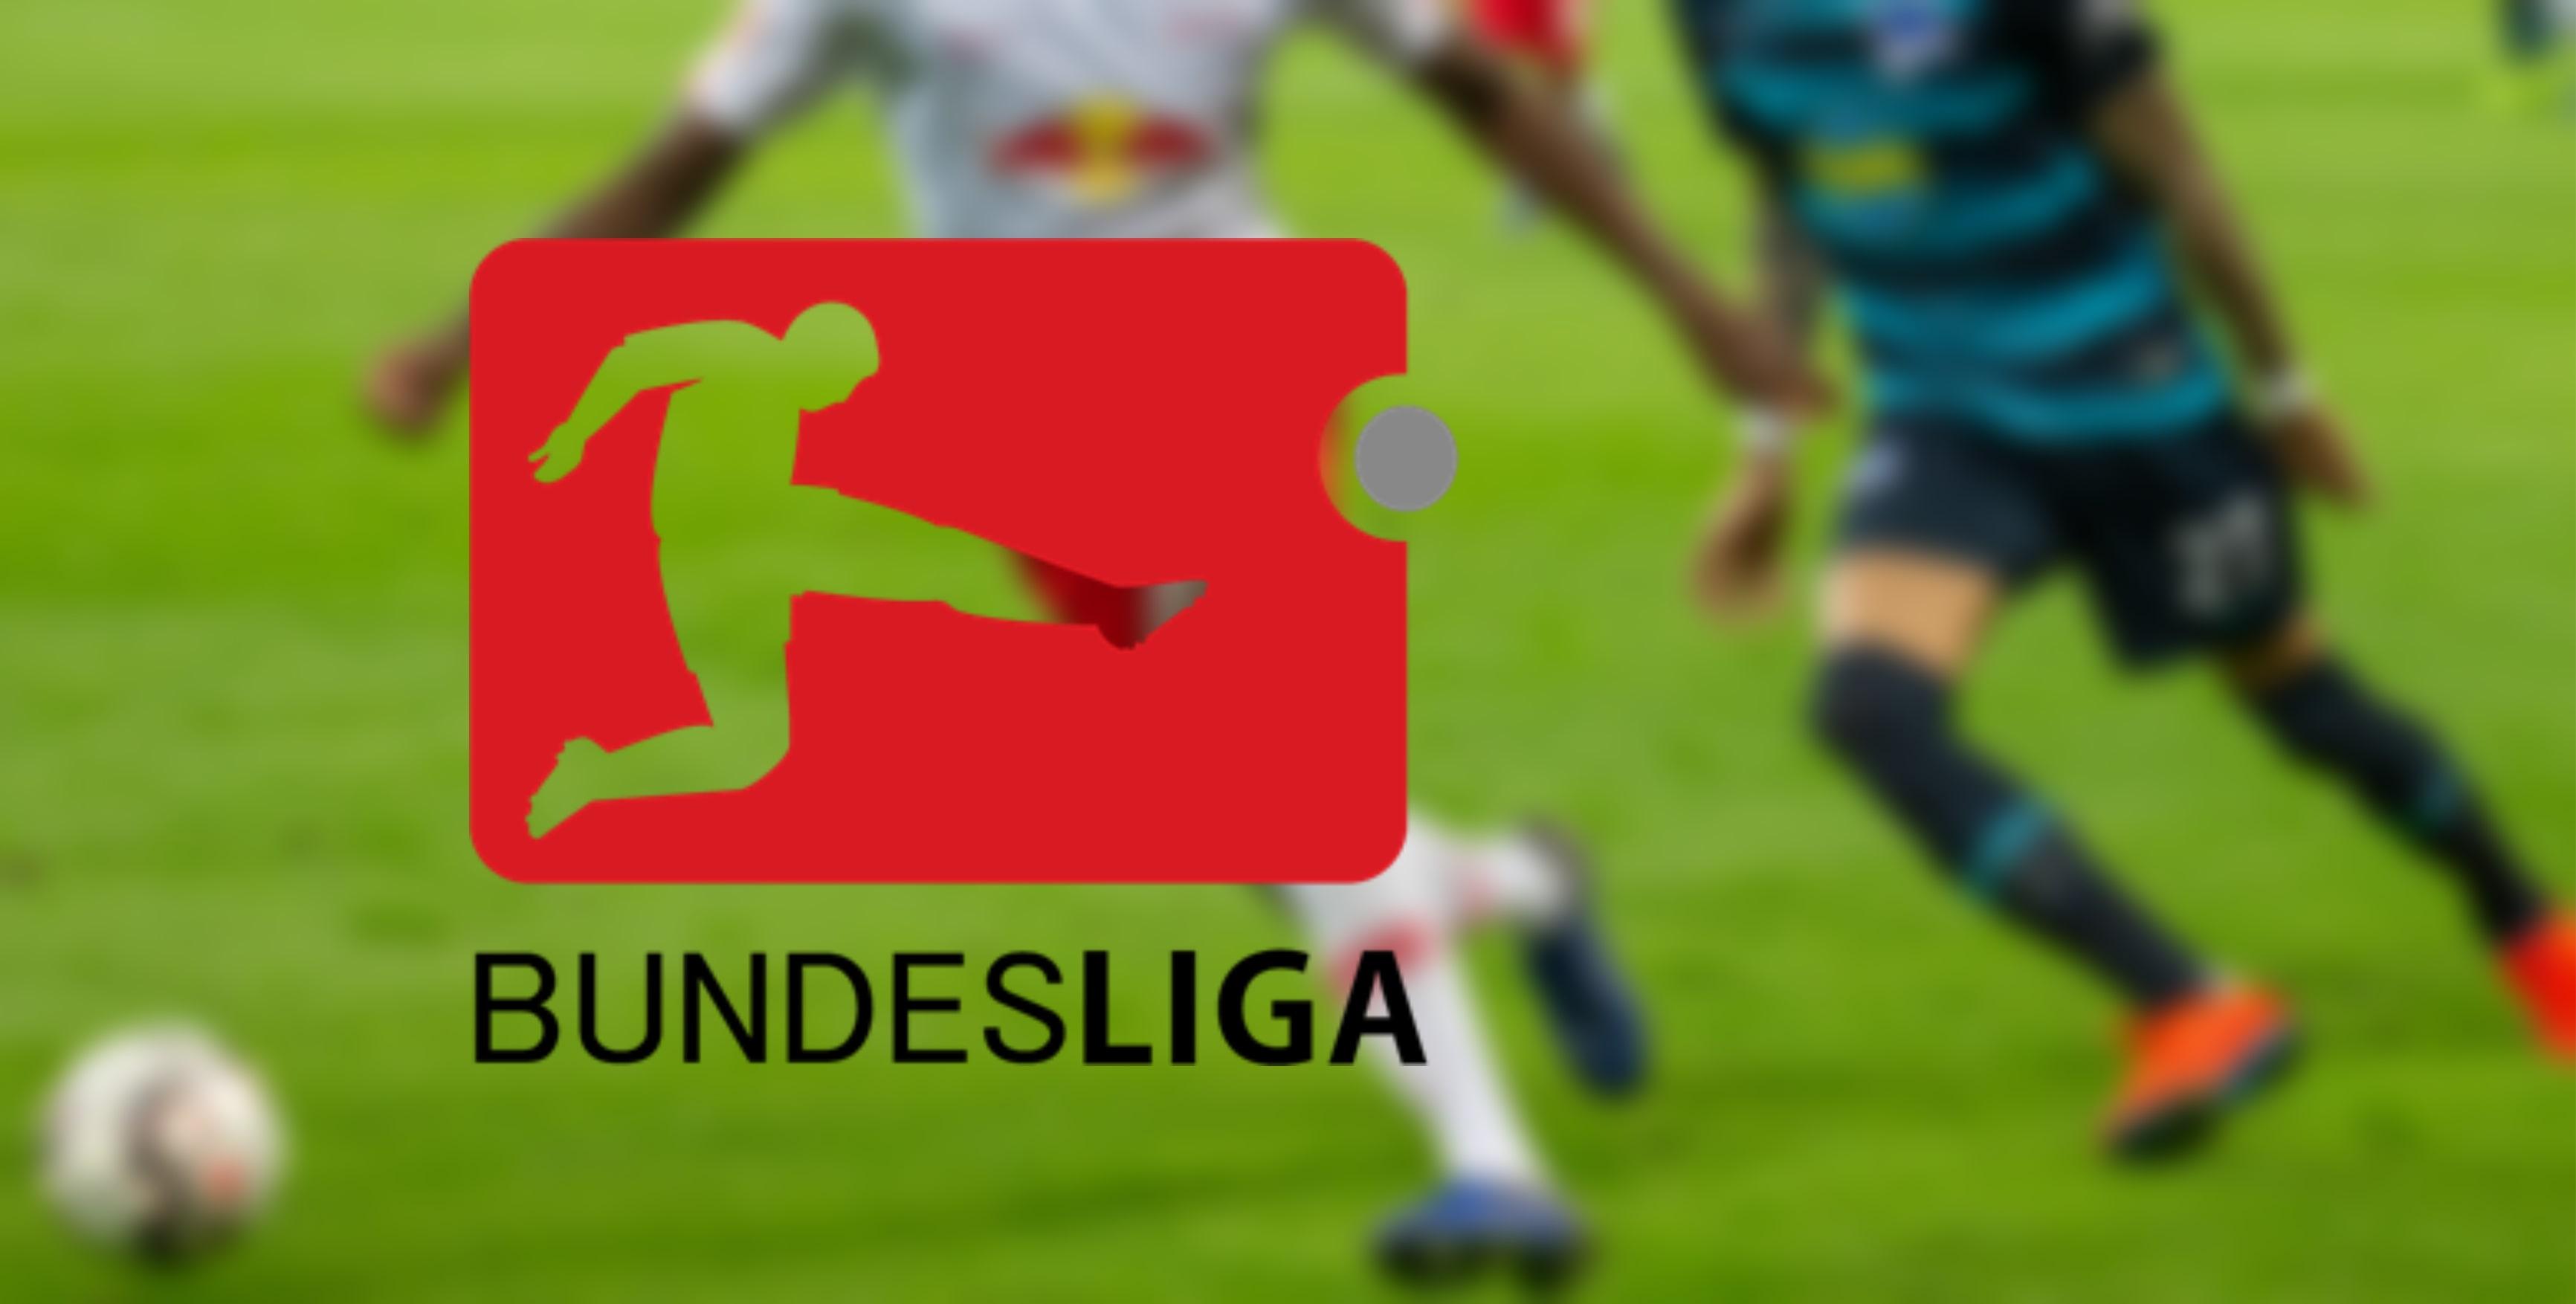 Bundesliga 2019/20 Match Day Two Round Up